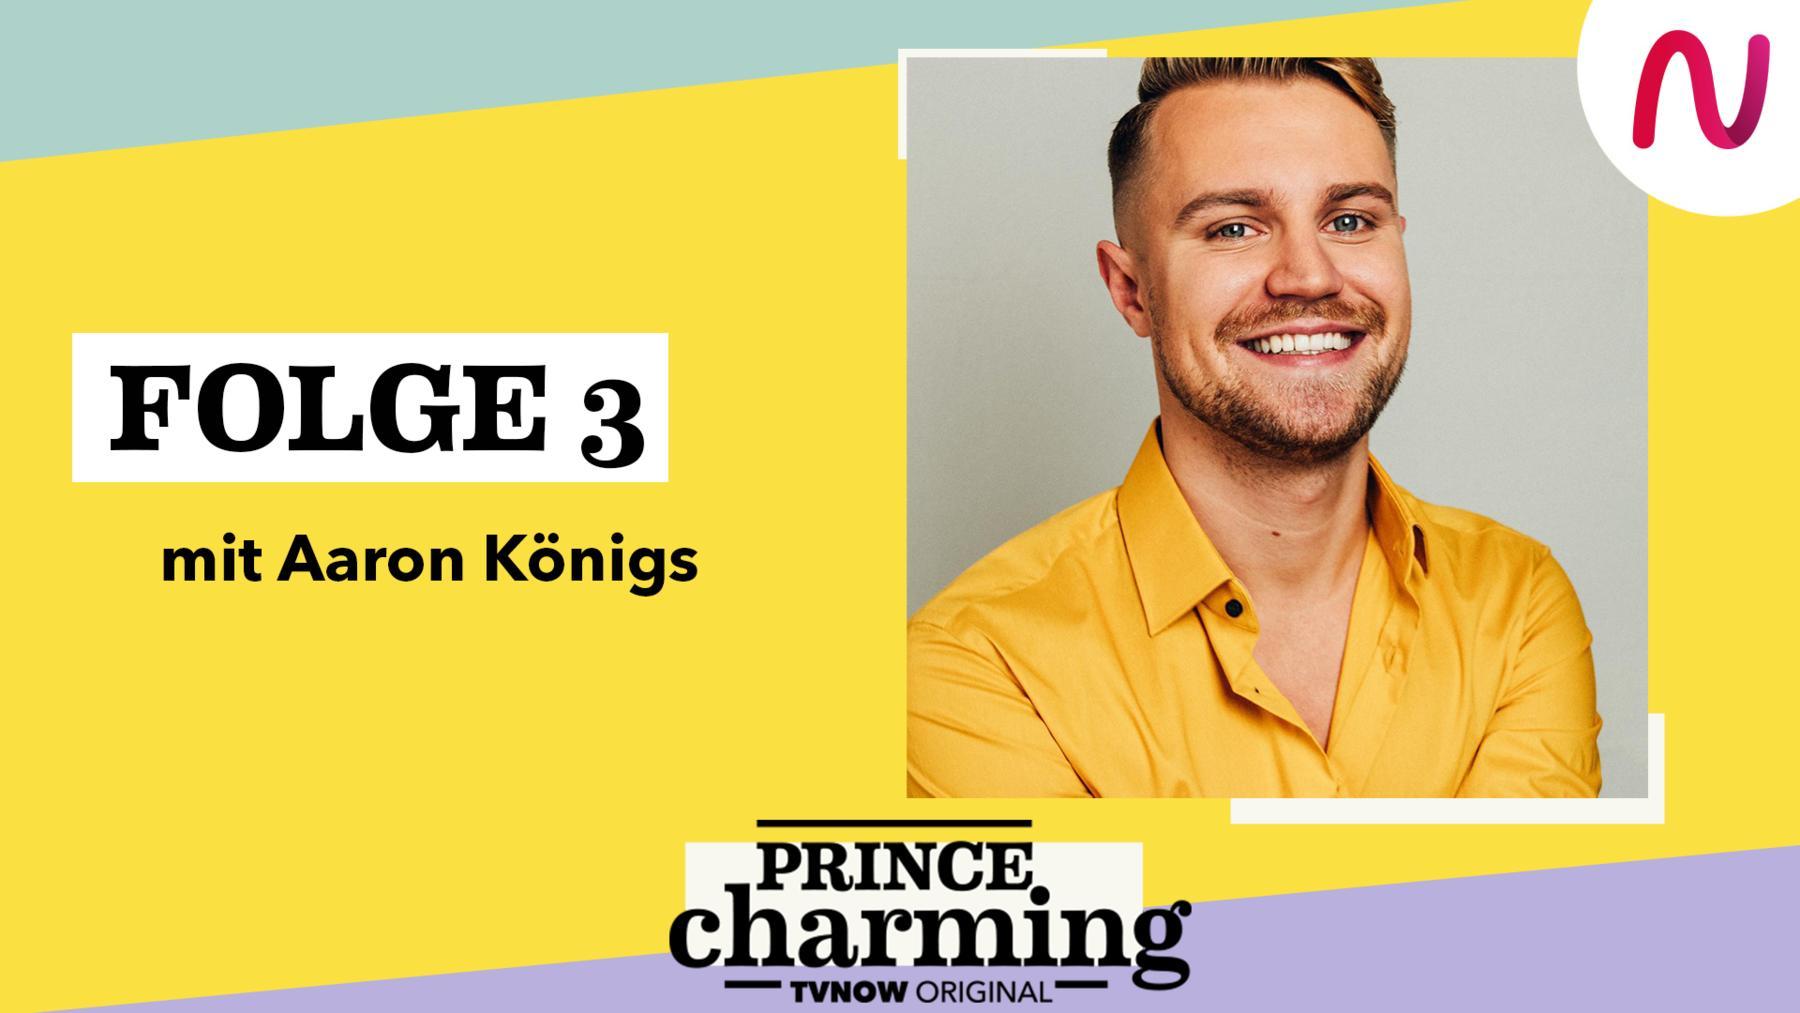 Folge 3 - Aaron Königs